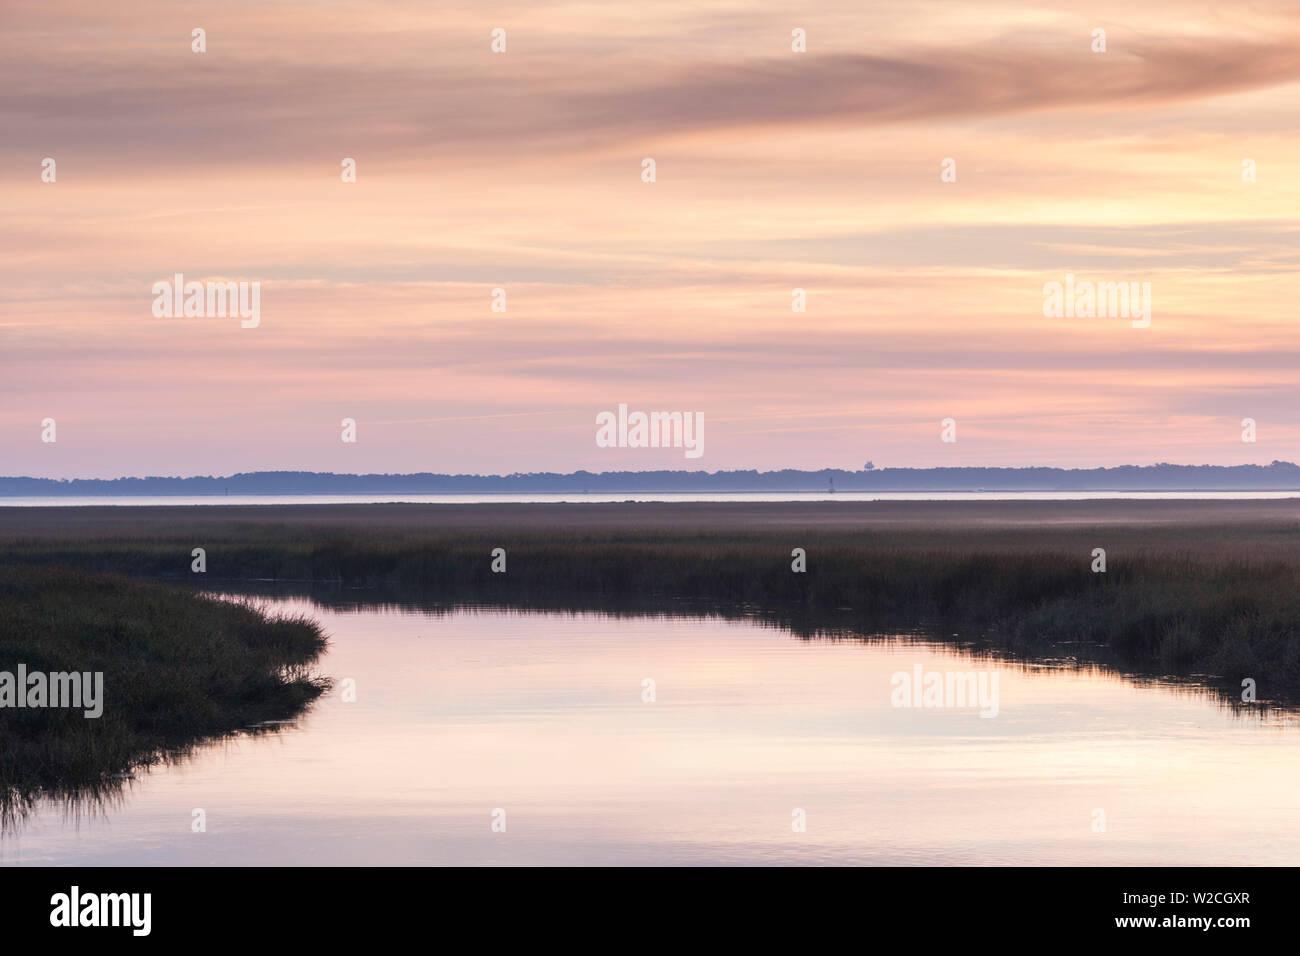 USA, Georgia, Brunswick view along the Bruswick River marshes - Stock Image